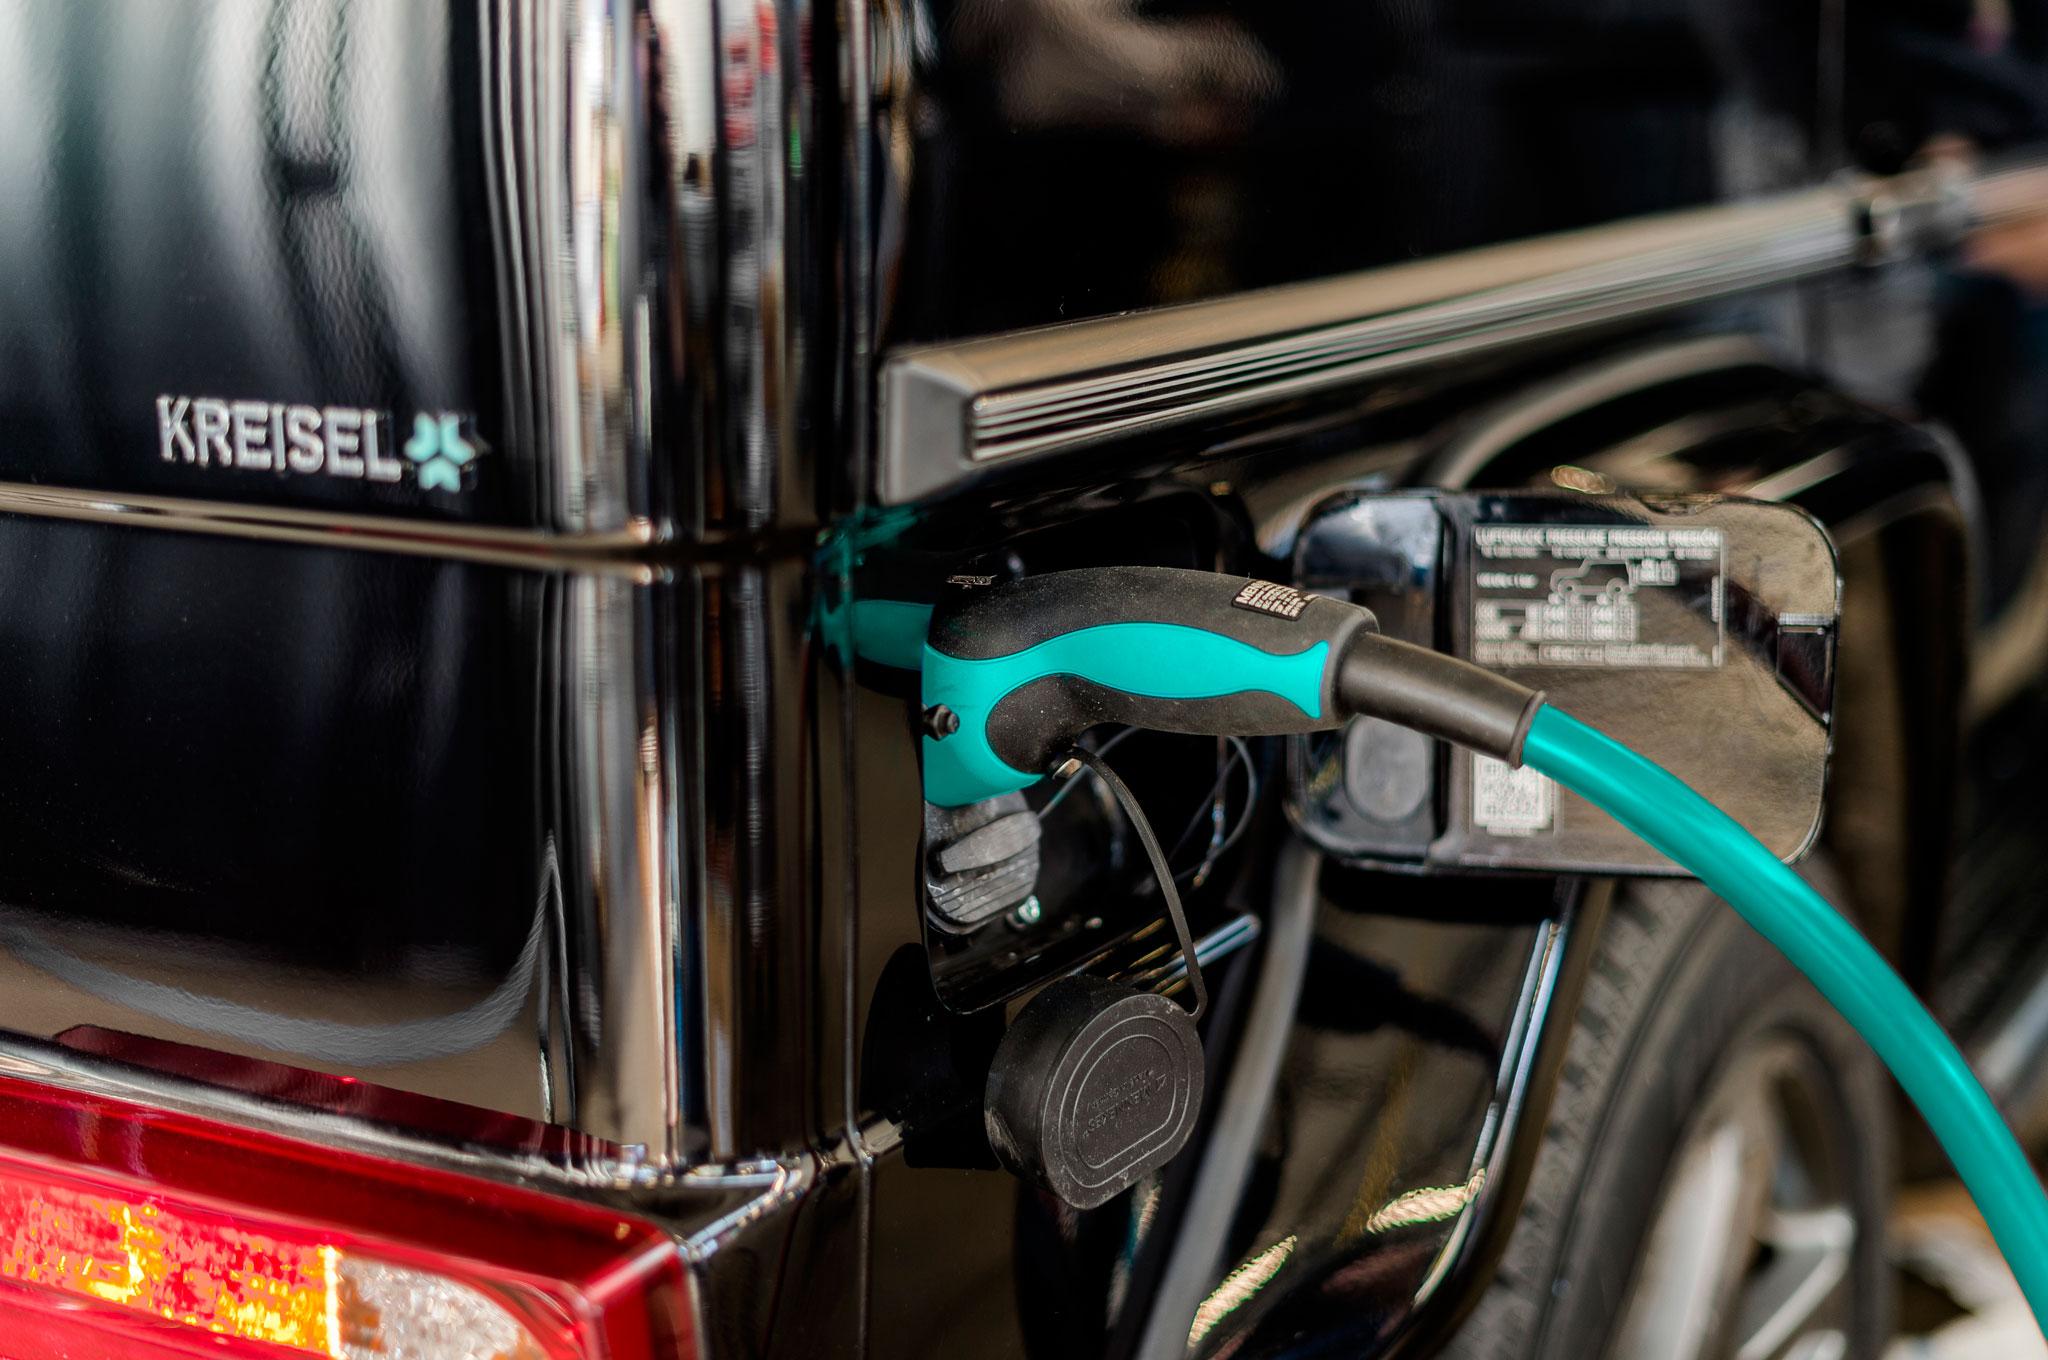 arnold schwarzenegger kreisel electric g wagen charging port